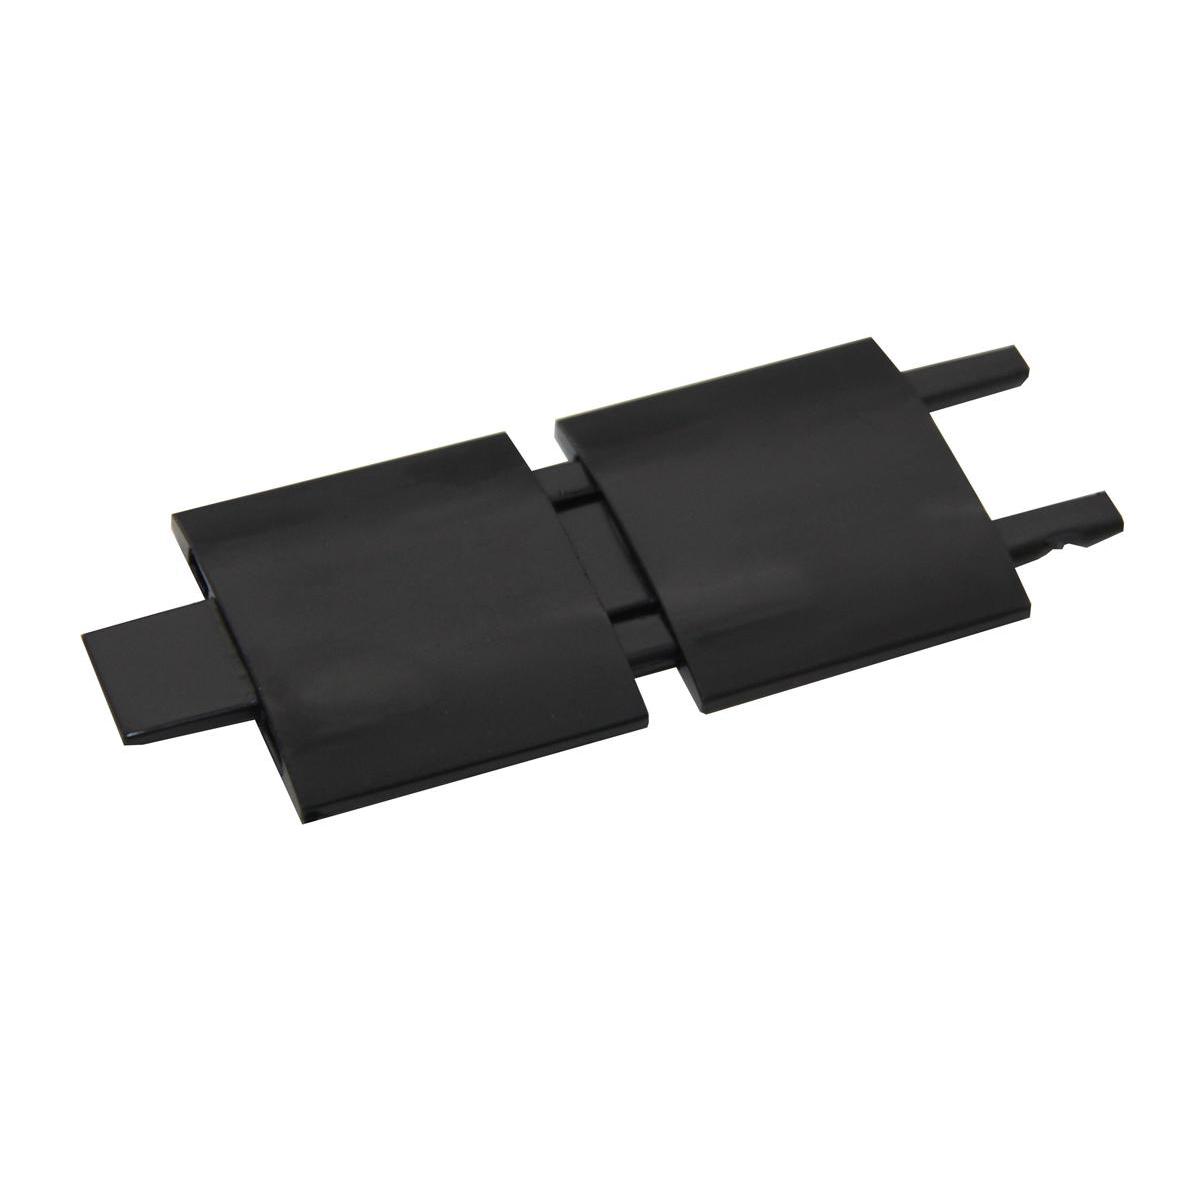 Rexel Agenda2 Risers W45xD6xH70mm Charcoal Ref 2101019 Pack 5